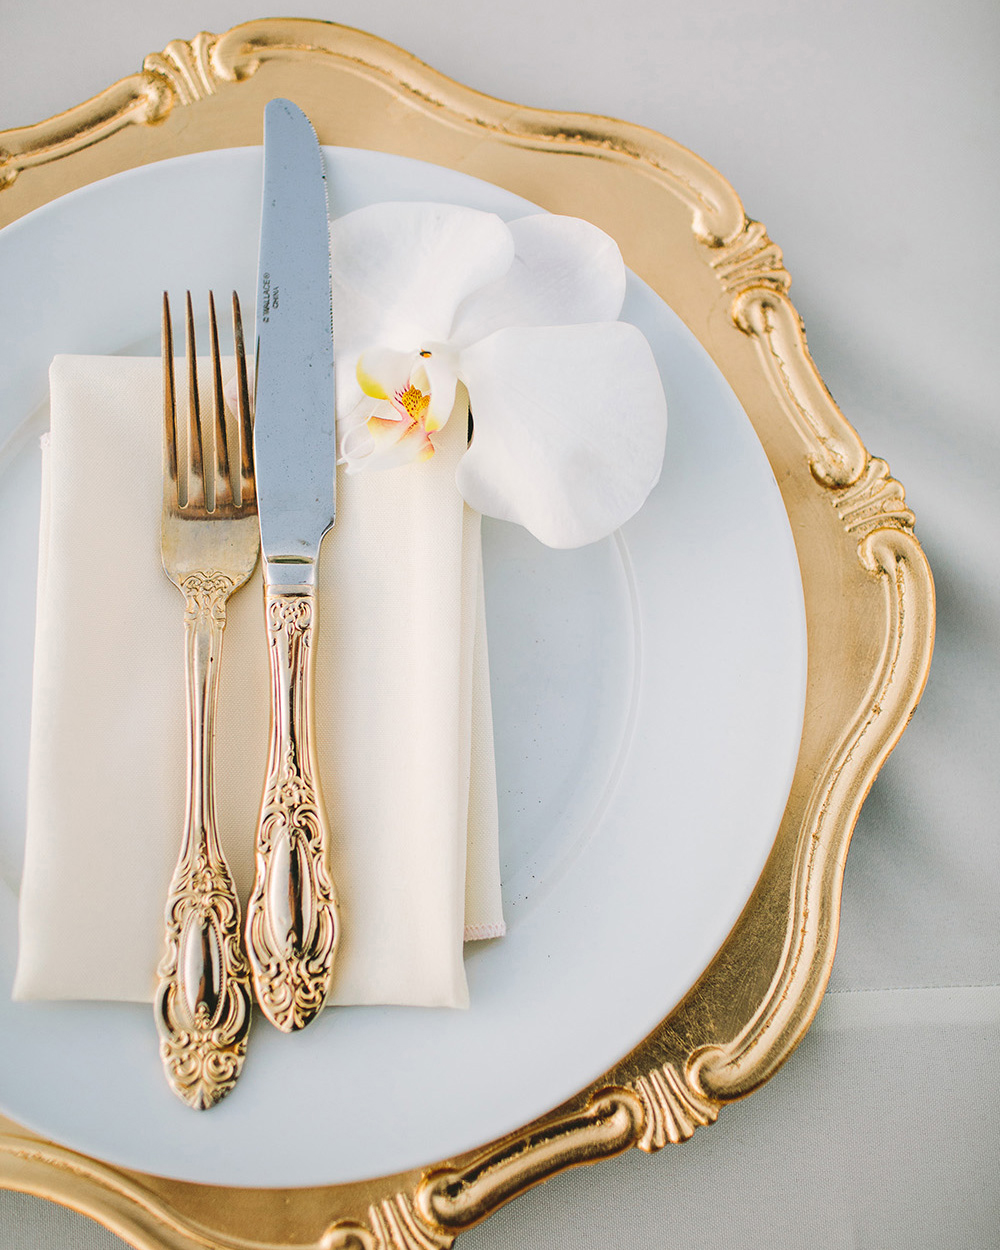 glamorous wedding ideas gold and white table setting